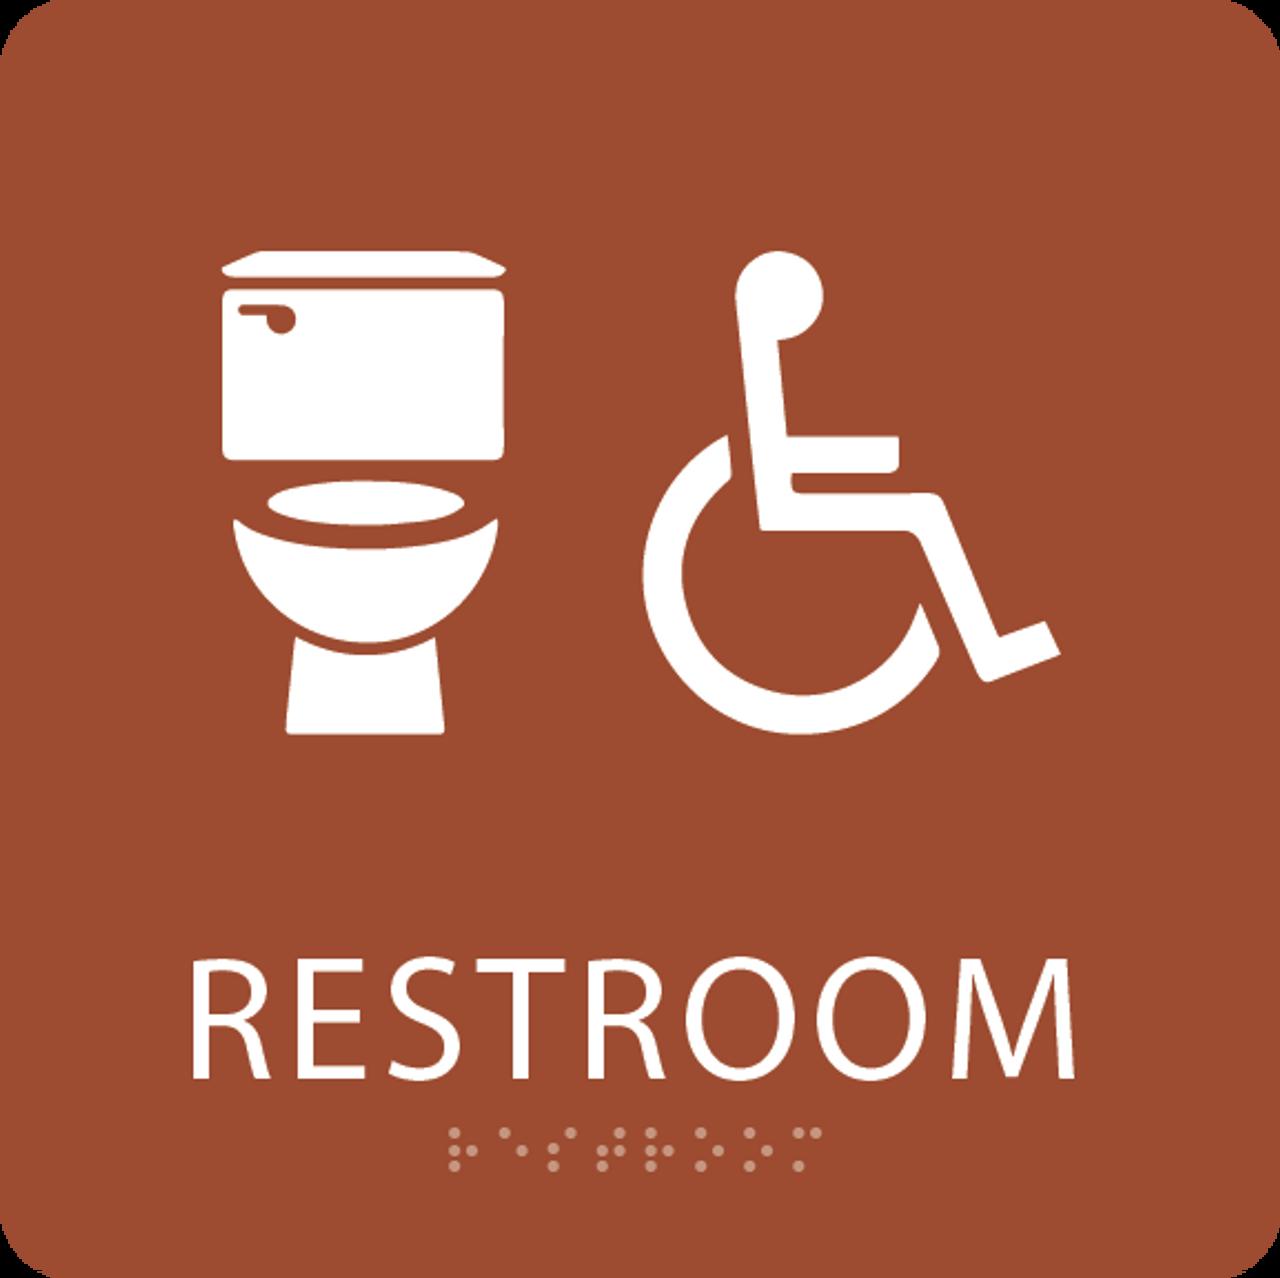 Orange Accessible Toilet Sign